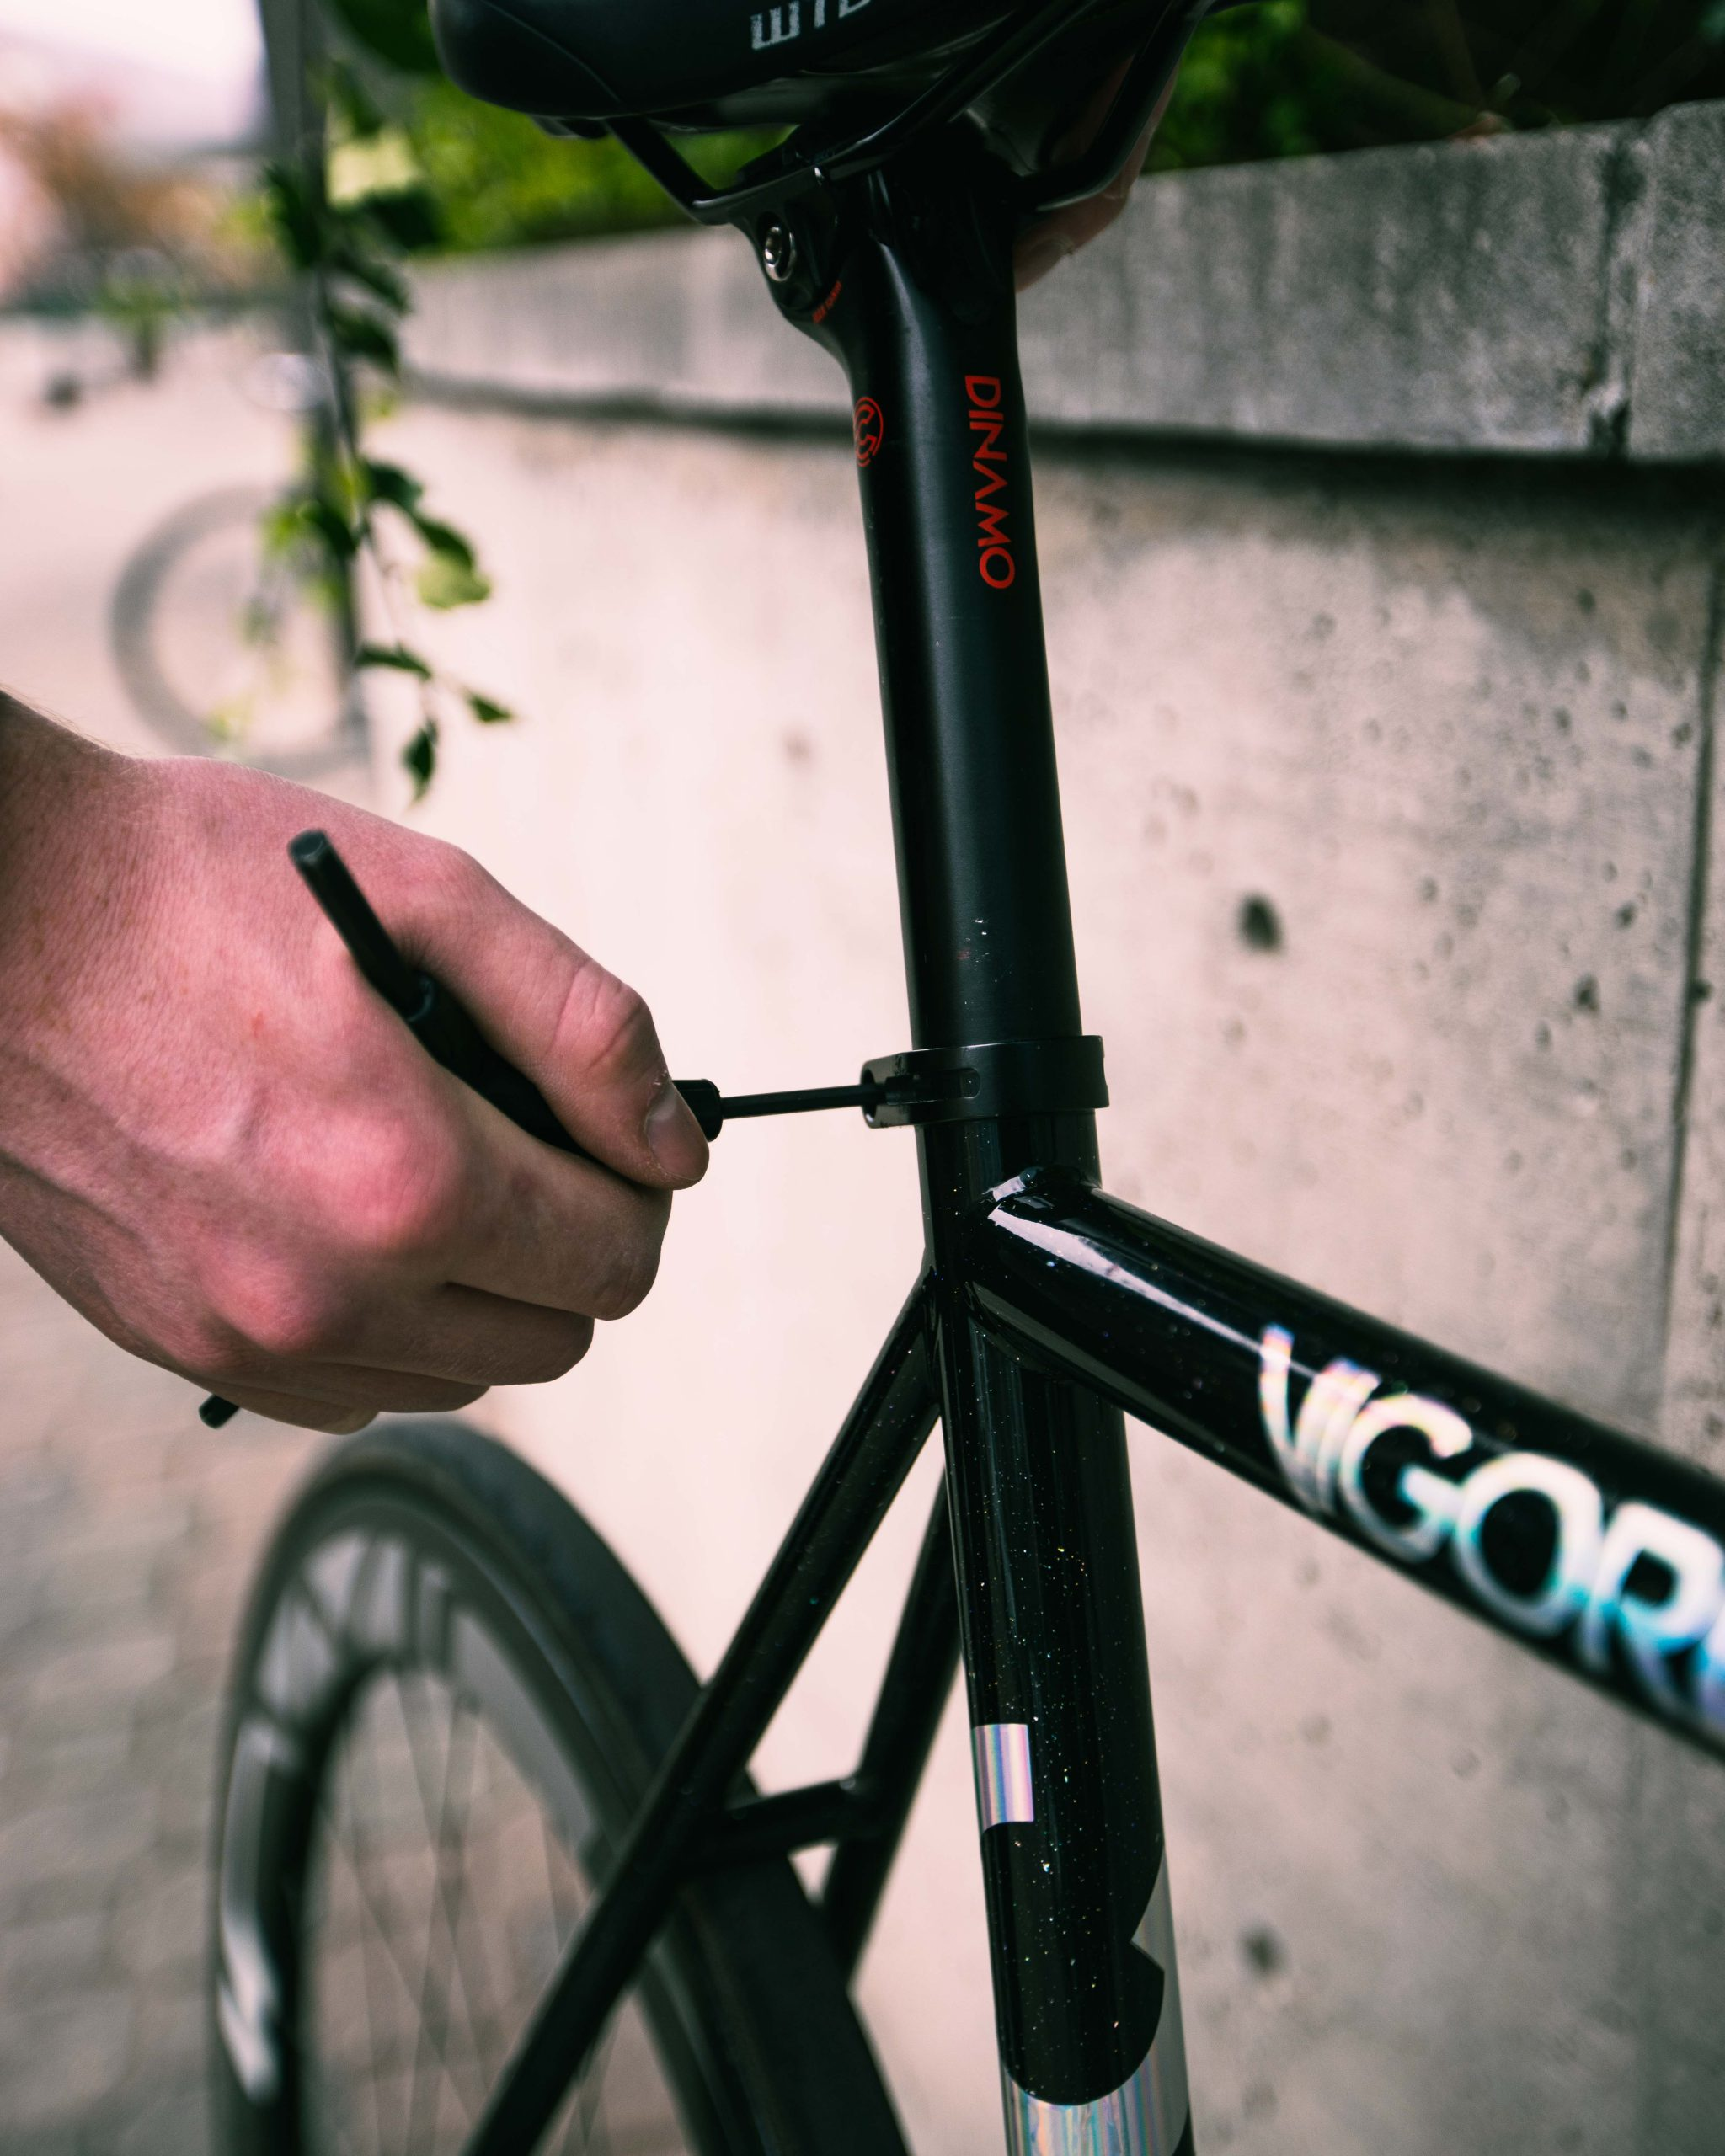 Tri Tool tightening bicycle seat post